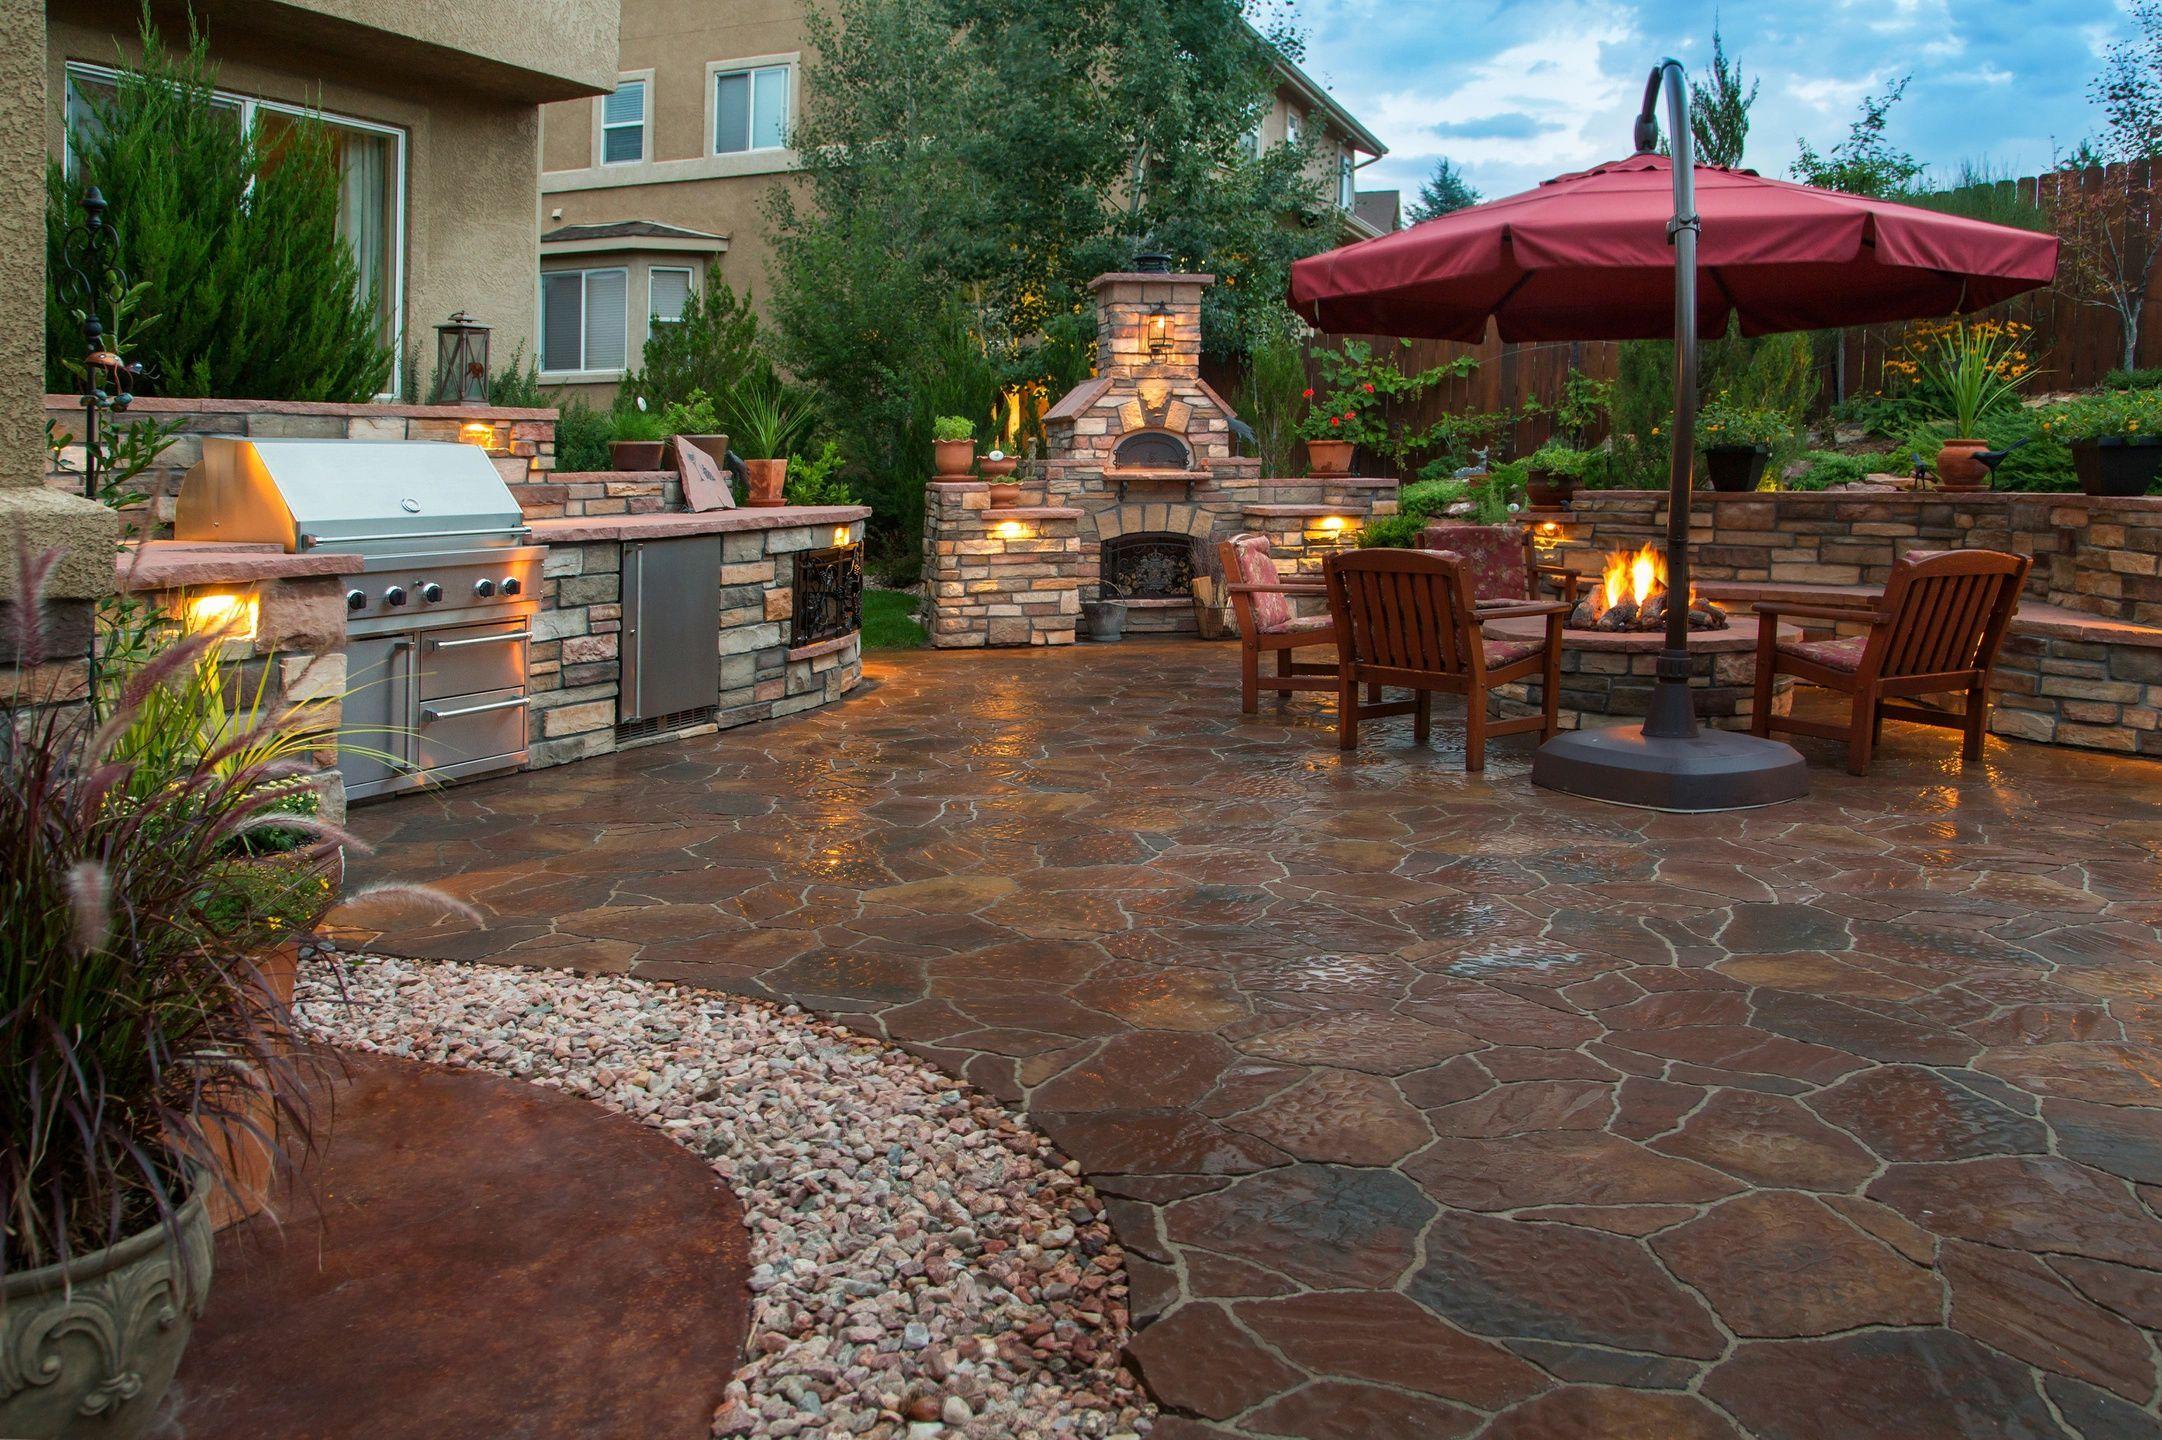 Westlake Tx Outdoor Patio Kitchen Texas Patios By Texas Patios